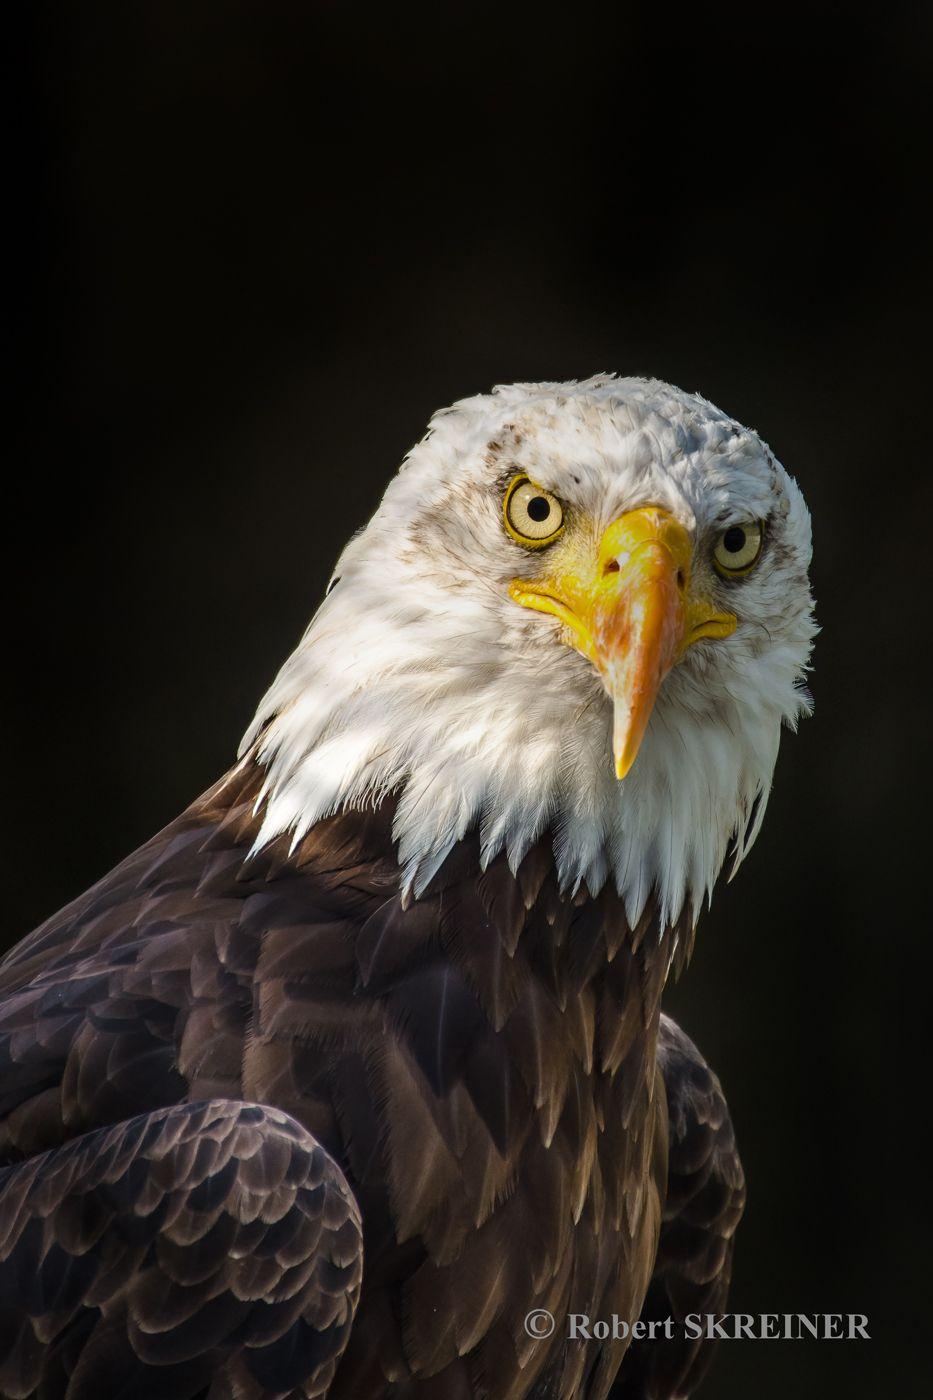 Bald Eagle  (Haliaeetus leucocephalus)  - Weißkopfseeadler Pygargue à tête blanche - Águila calva - Águia-de-cabeça-branca Aquila di mare testabianca wingspan 1.8 - 2.3 m (5.9 - 7.5 ft),  weight 3 - 6.3 kg (6.6 - 13.9 lb) See more photos at: SKREINER.COM